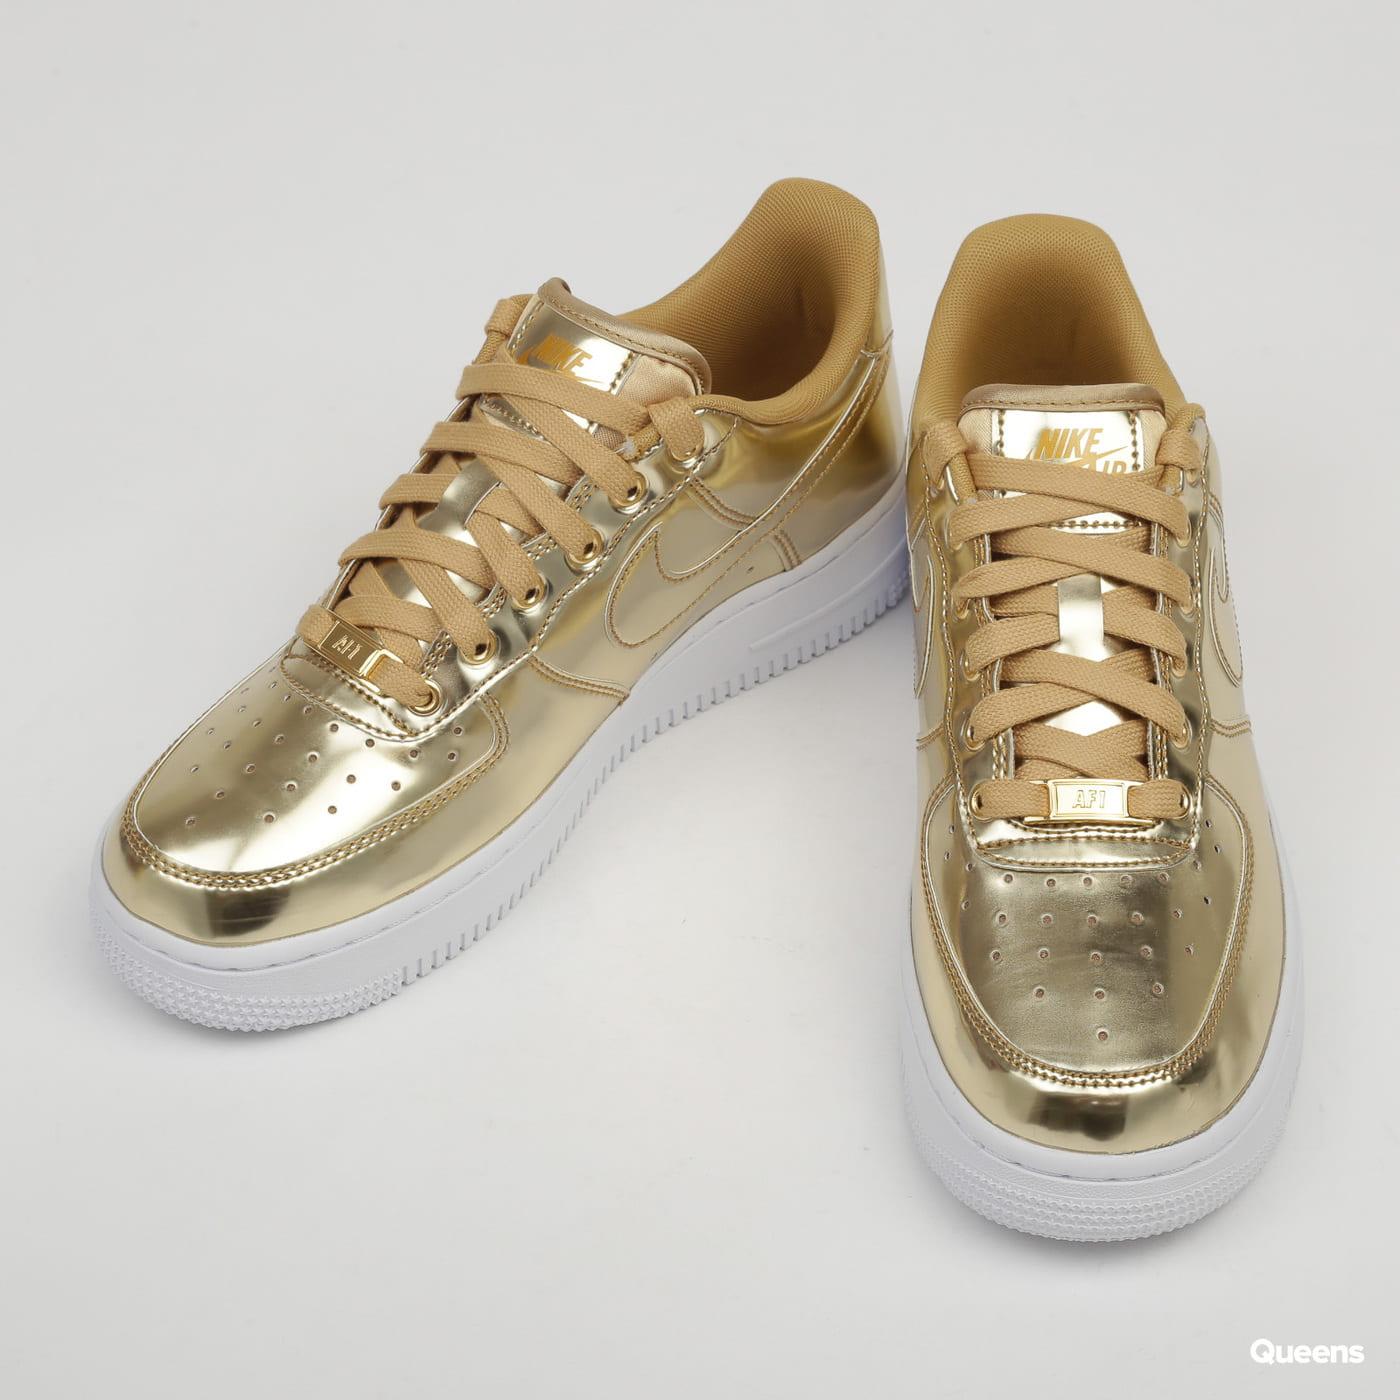 Nike W Air Force 1 SP metallic gold / club gold - white